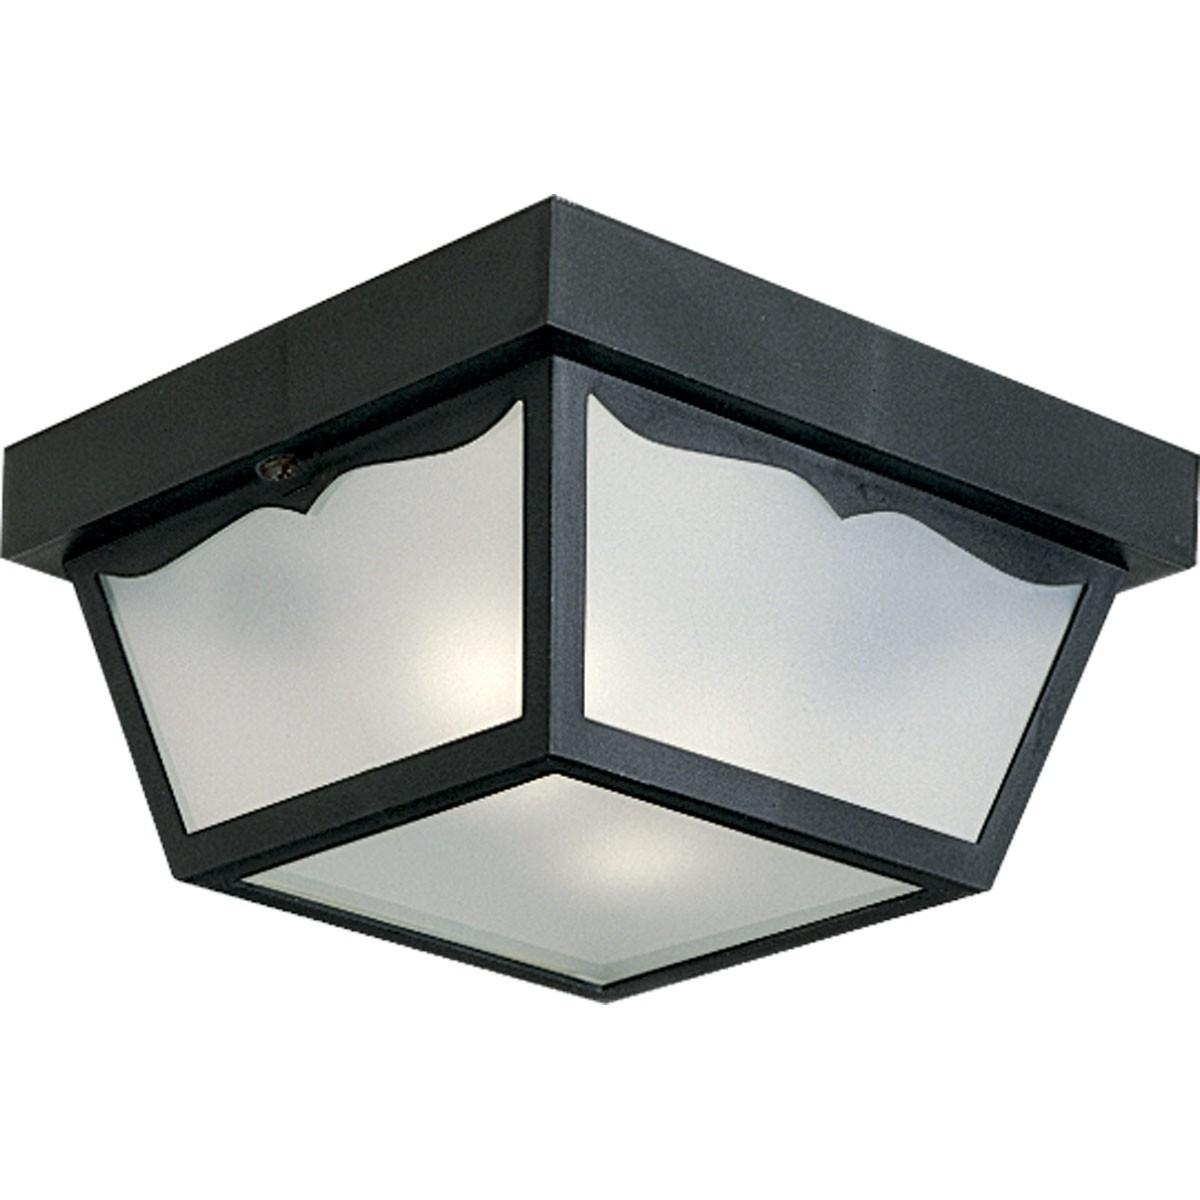 Outdoor Ceiling Mount Motion Sensor Light • Outdoor Lighting Regarding Most Popular Outdoor Ceiling Sensor Lights (View 8 of 20)